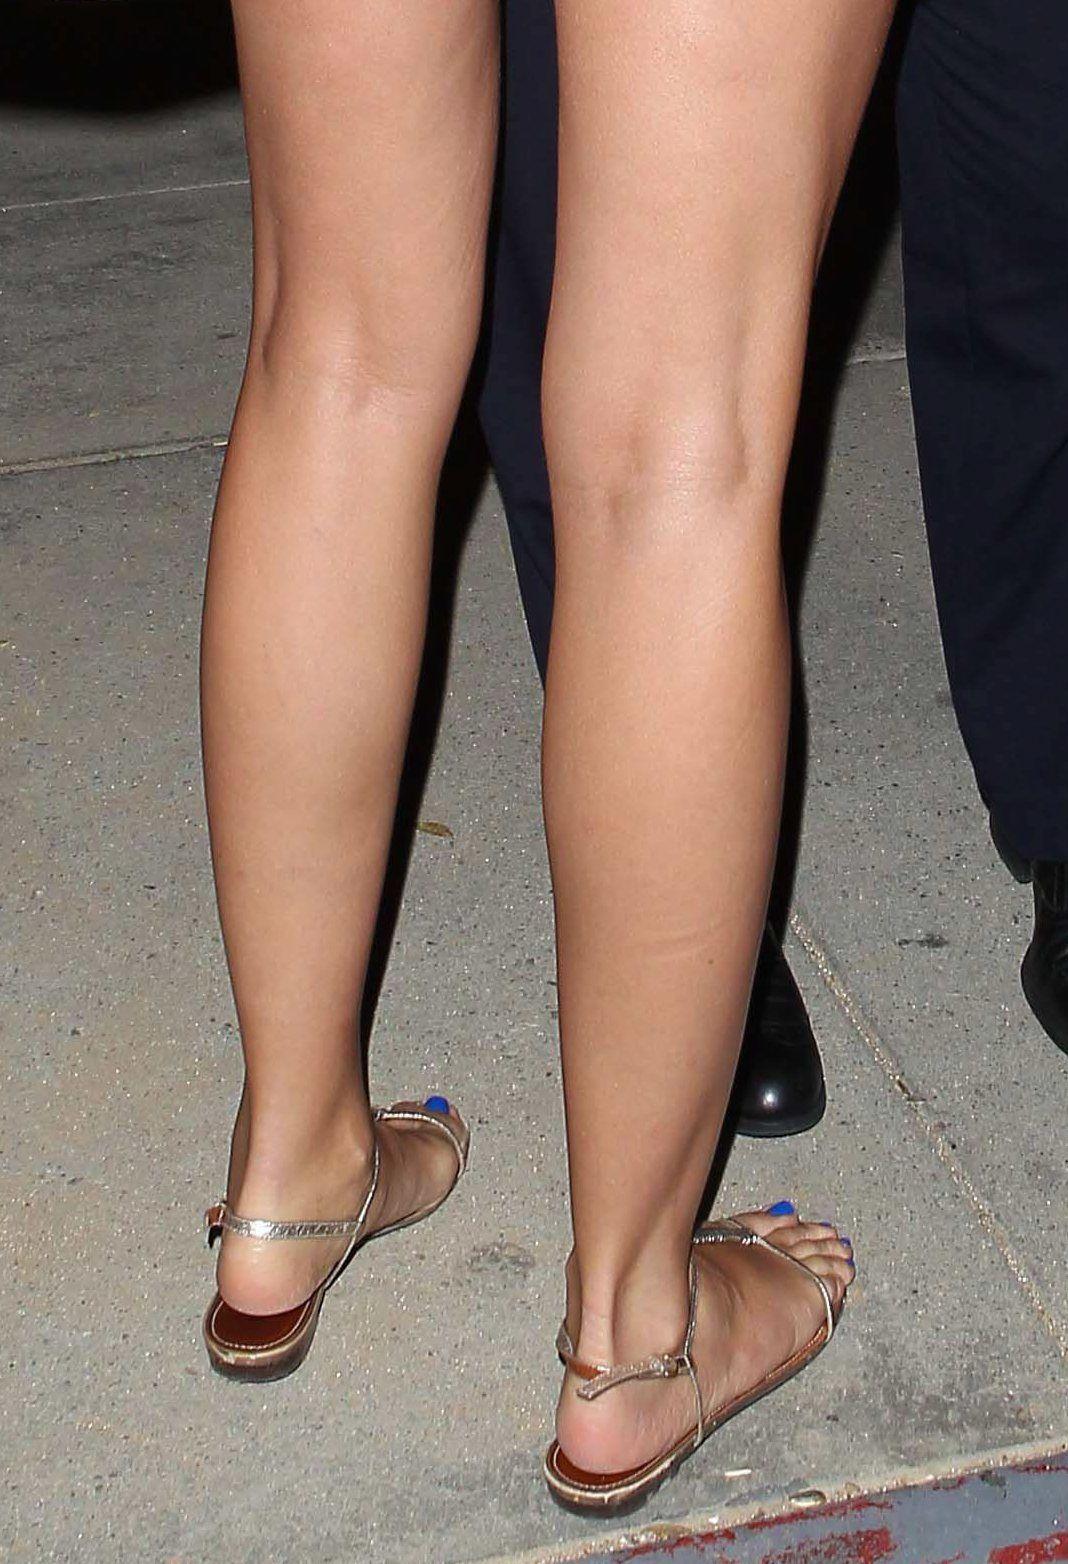 cameron diaz nude legs